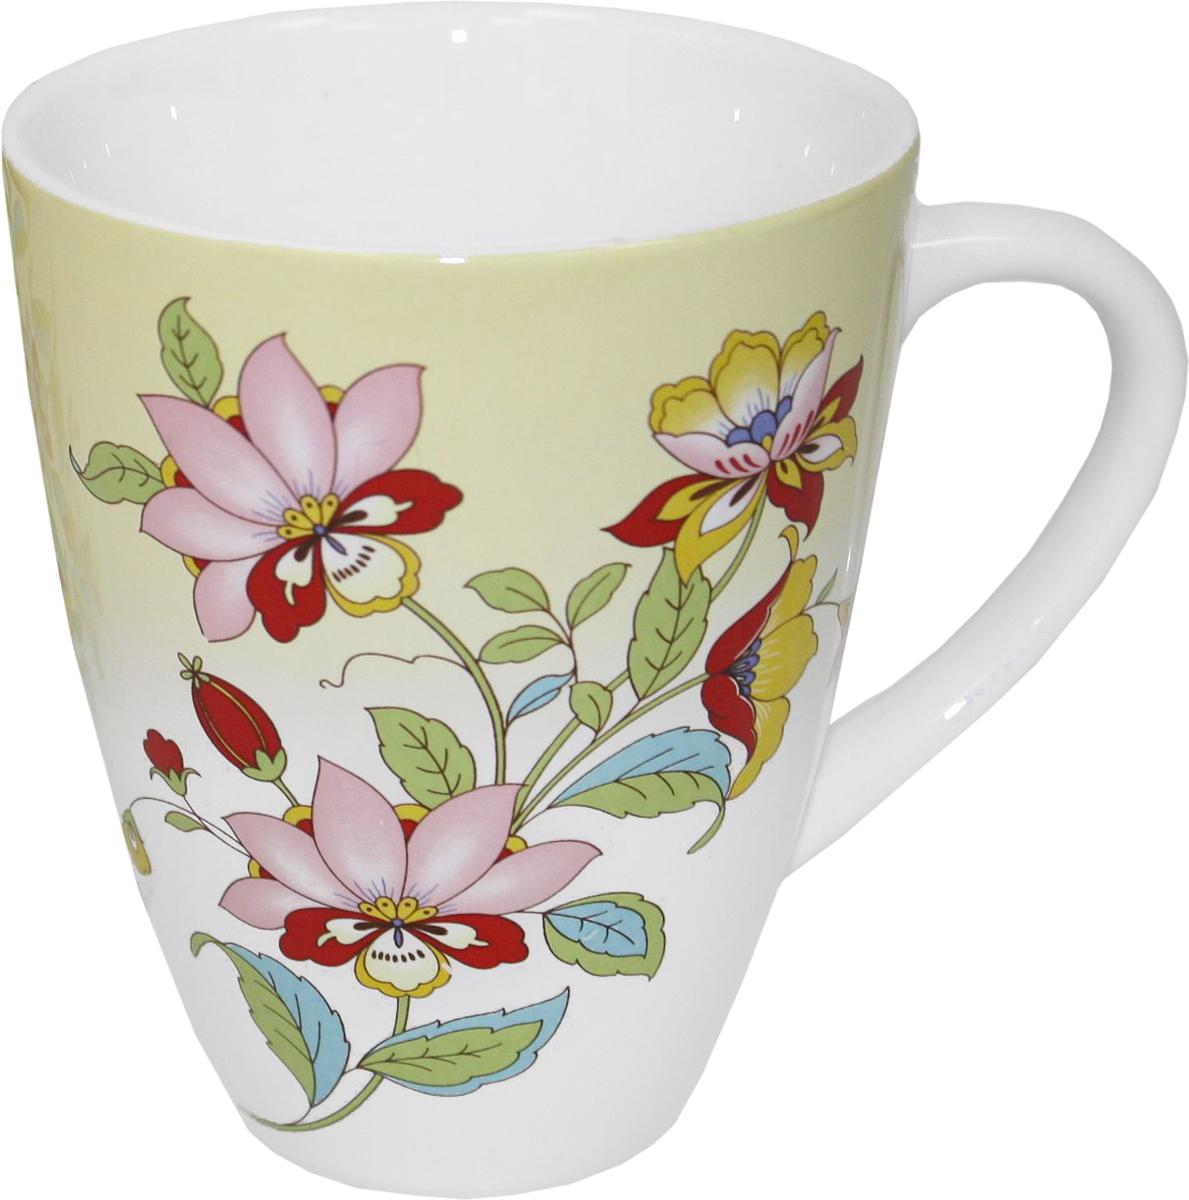 Кружка Azulejo Espanol Ceramica Sunny Flowers, 300 мл216850